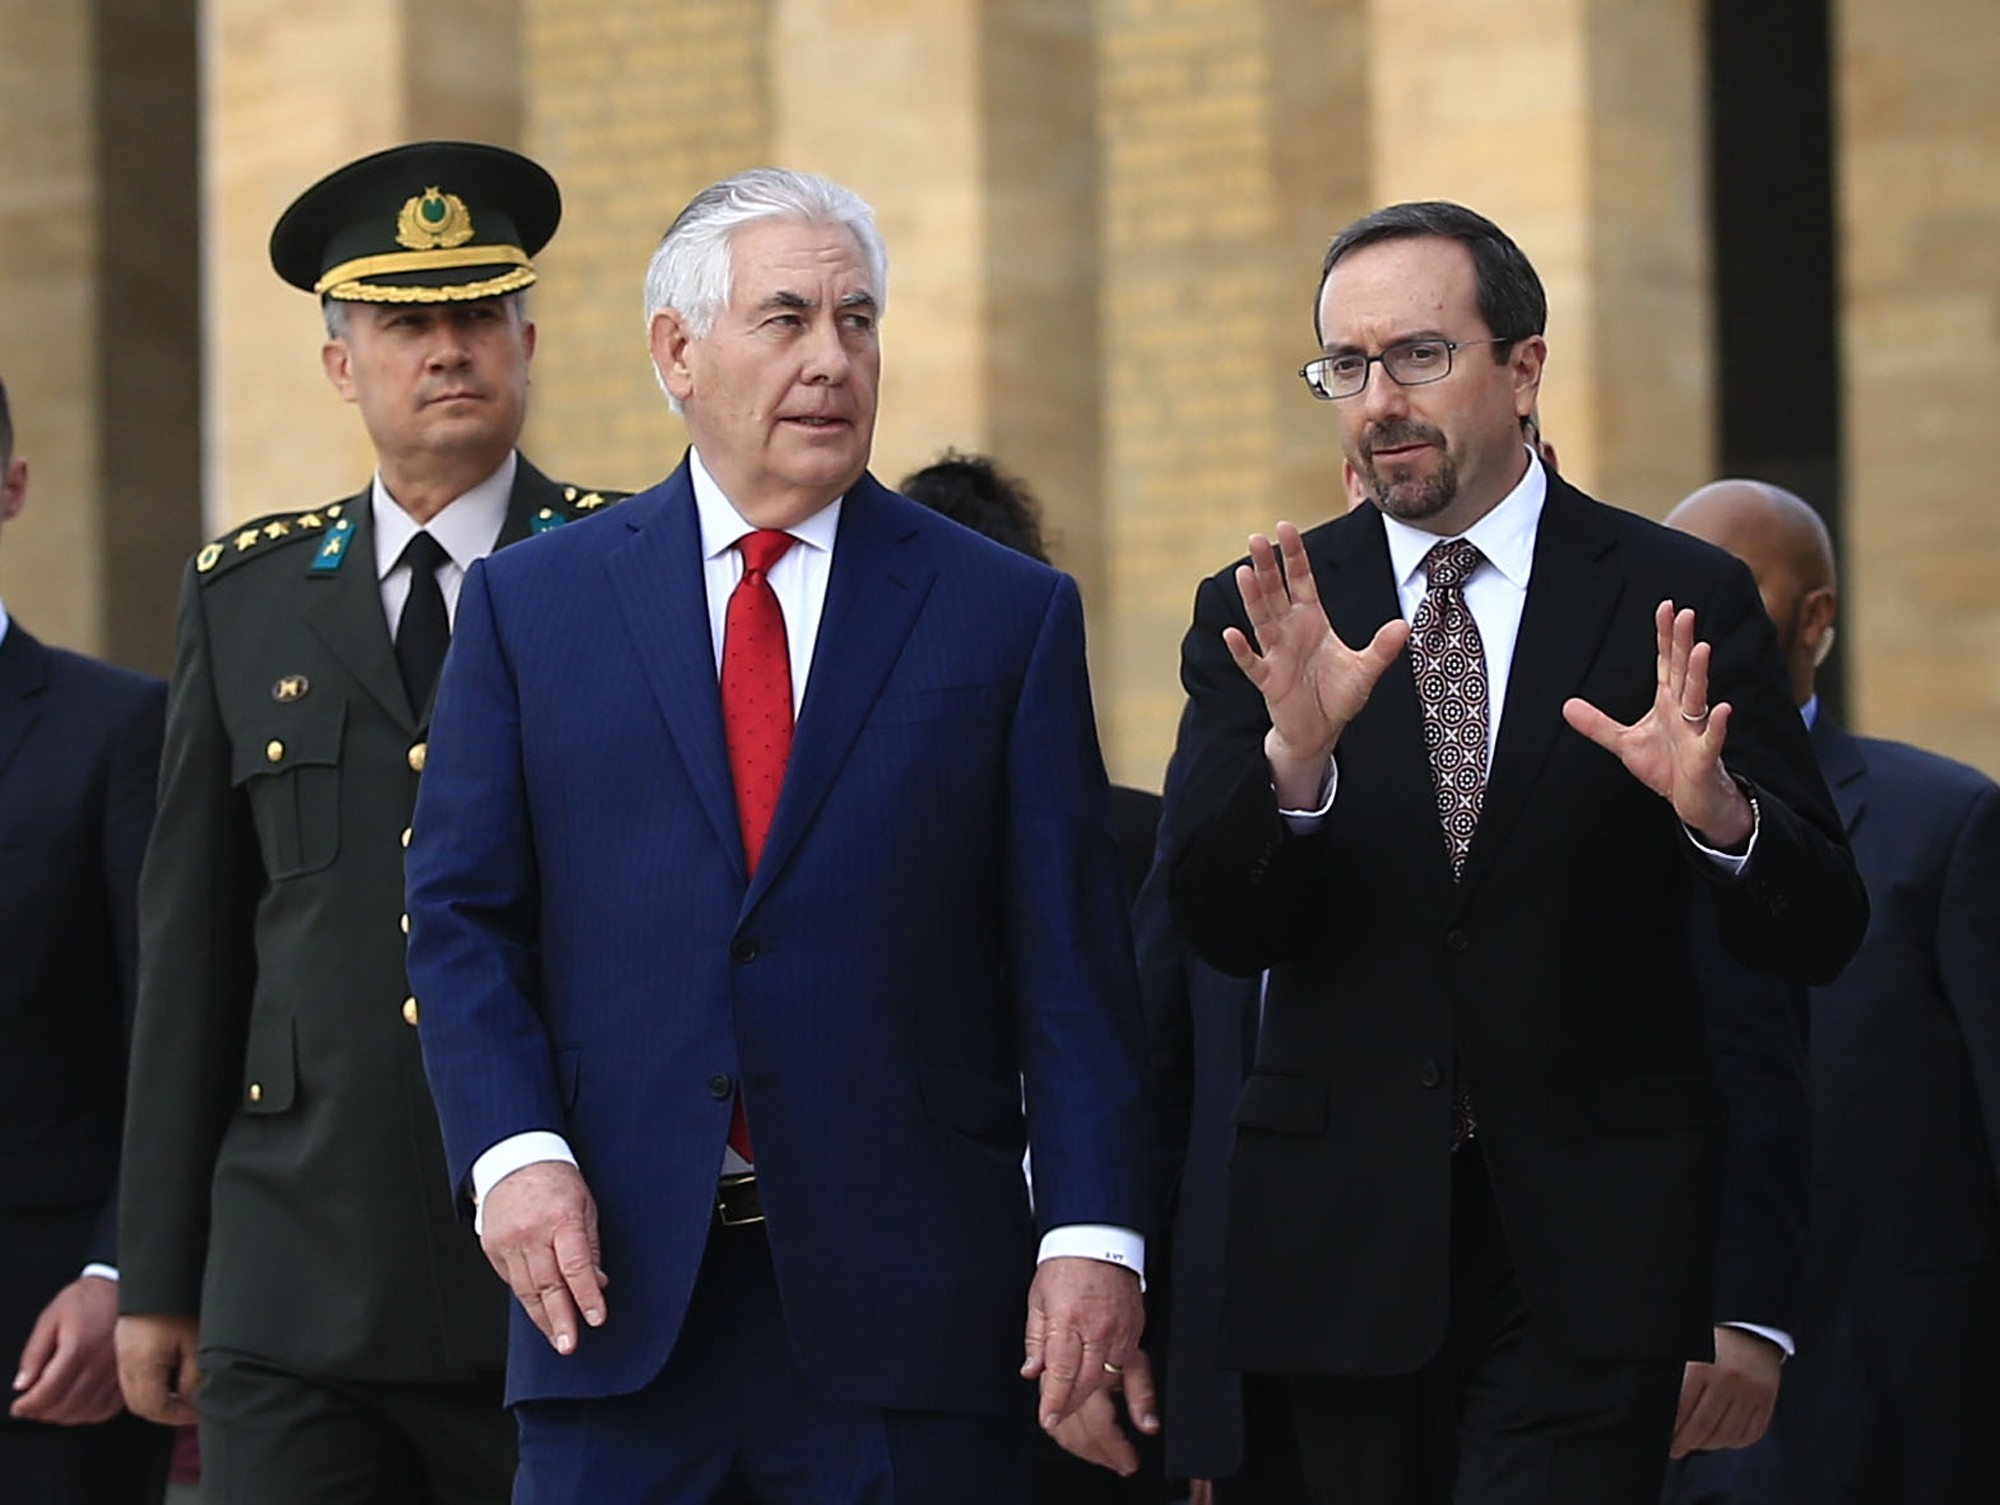 U.S. Ambassador John Bass (R) talks to U.S. Secretary of State Rex Tillerson (L) during a visit in Ankara, March 30.